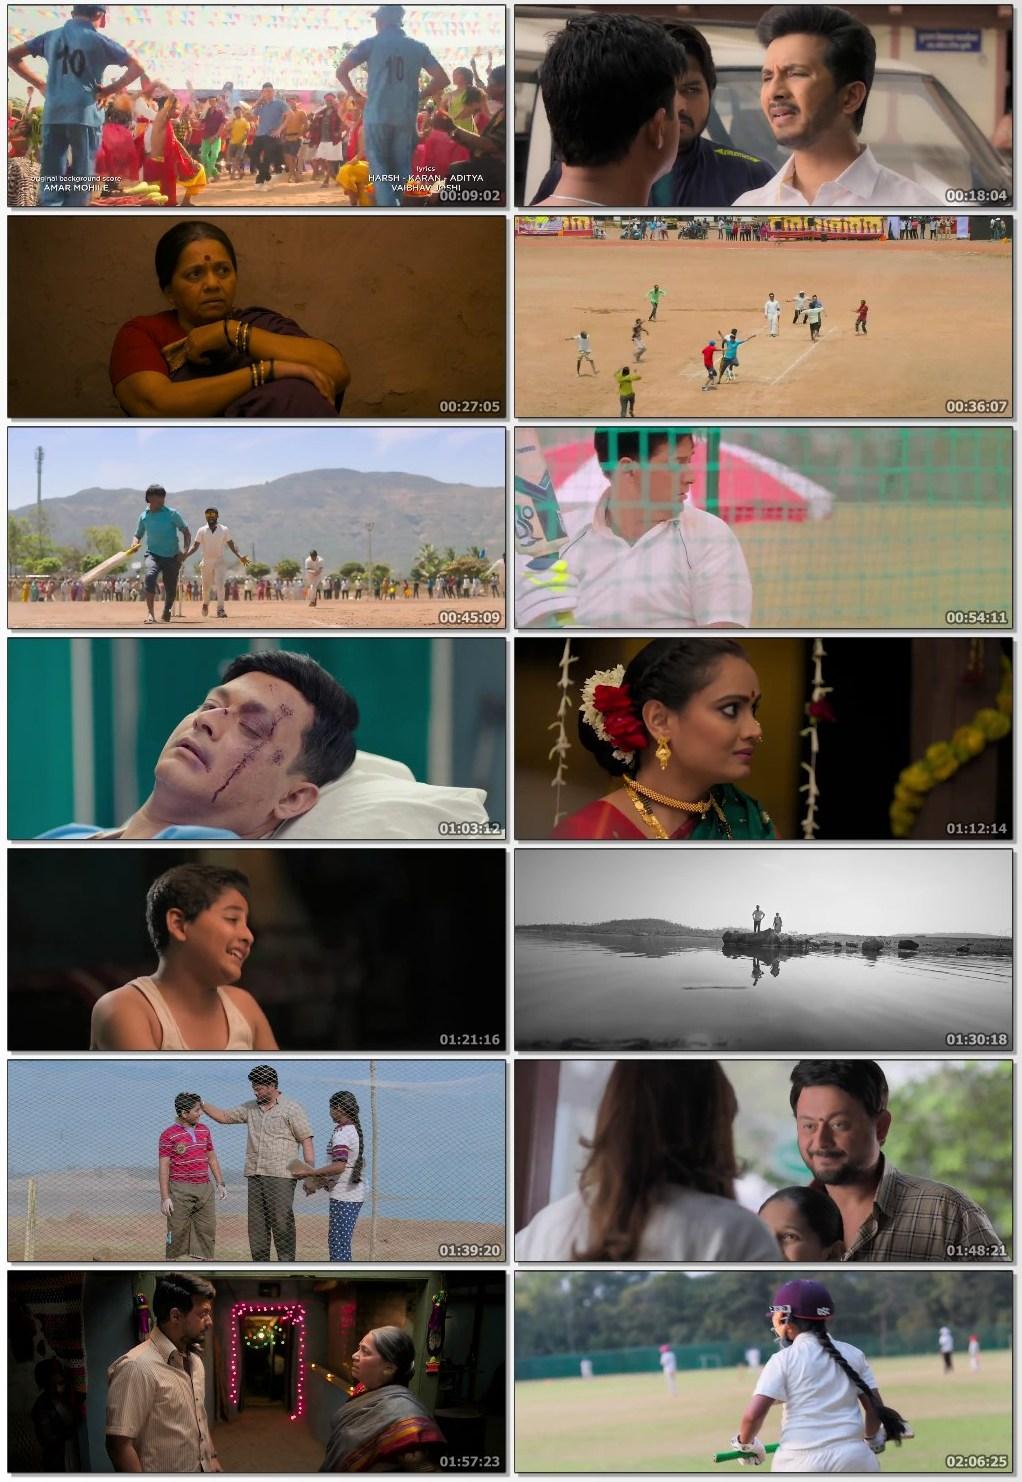 Me pan sachin movie download 480p, Me pan sachin movie download 720p, Me pan sachin movie download 300mb, Me pan sachin movie download free